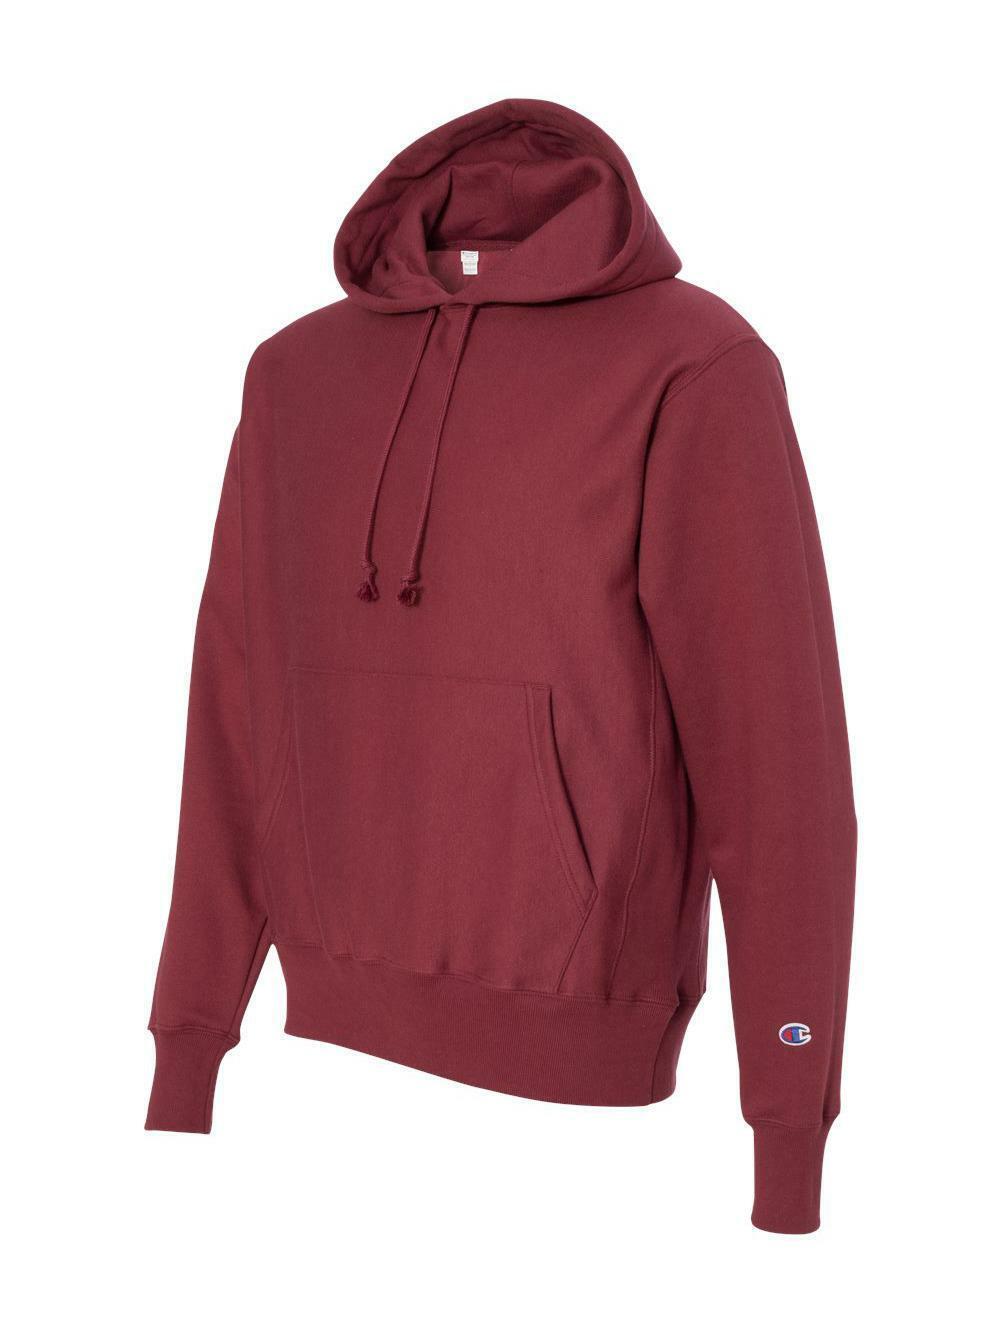 Champion Mens Reverse Weave Hooded Sweatshirt Heavy Hoodie S101 S,M,L,XL,2XL,3XL